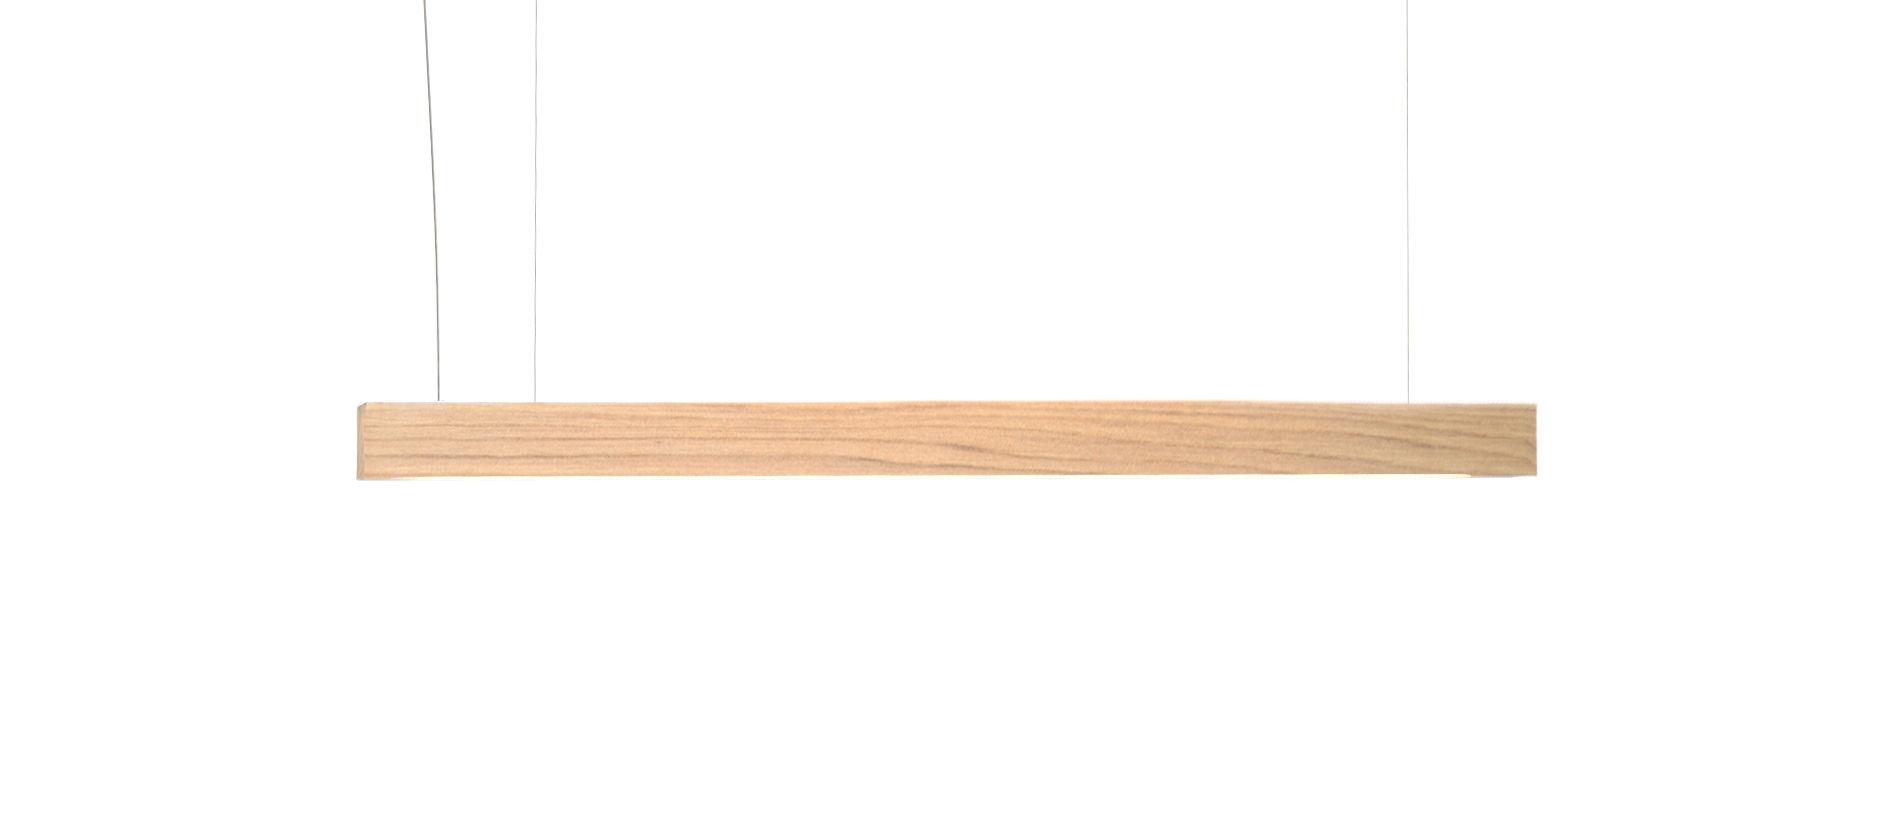 Luminaire - Suspensions - Suspension Led40 / L 70 cm - Chêne - Tunto - L 70 cm / Chêne - Chêne massif huilé, Polypropylène